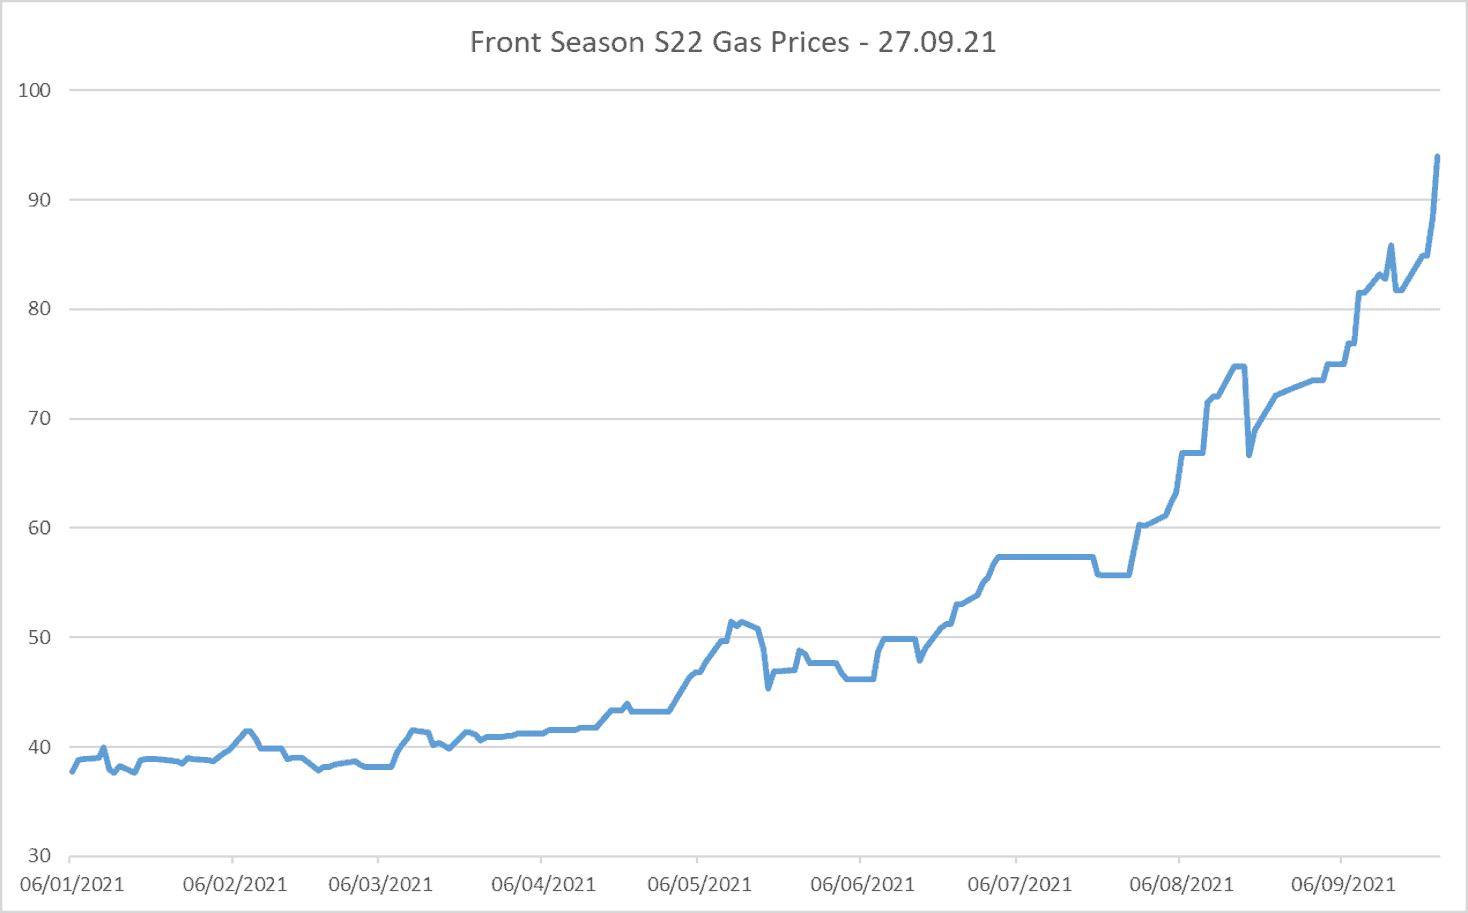 Summer 22 gas prices 27.09.21